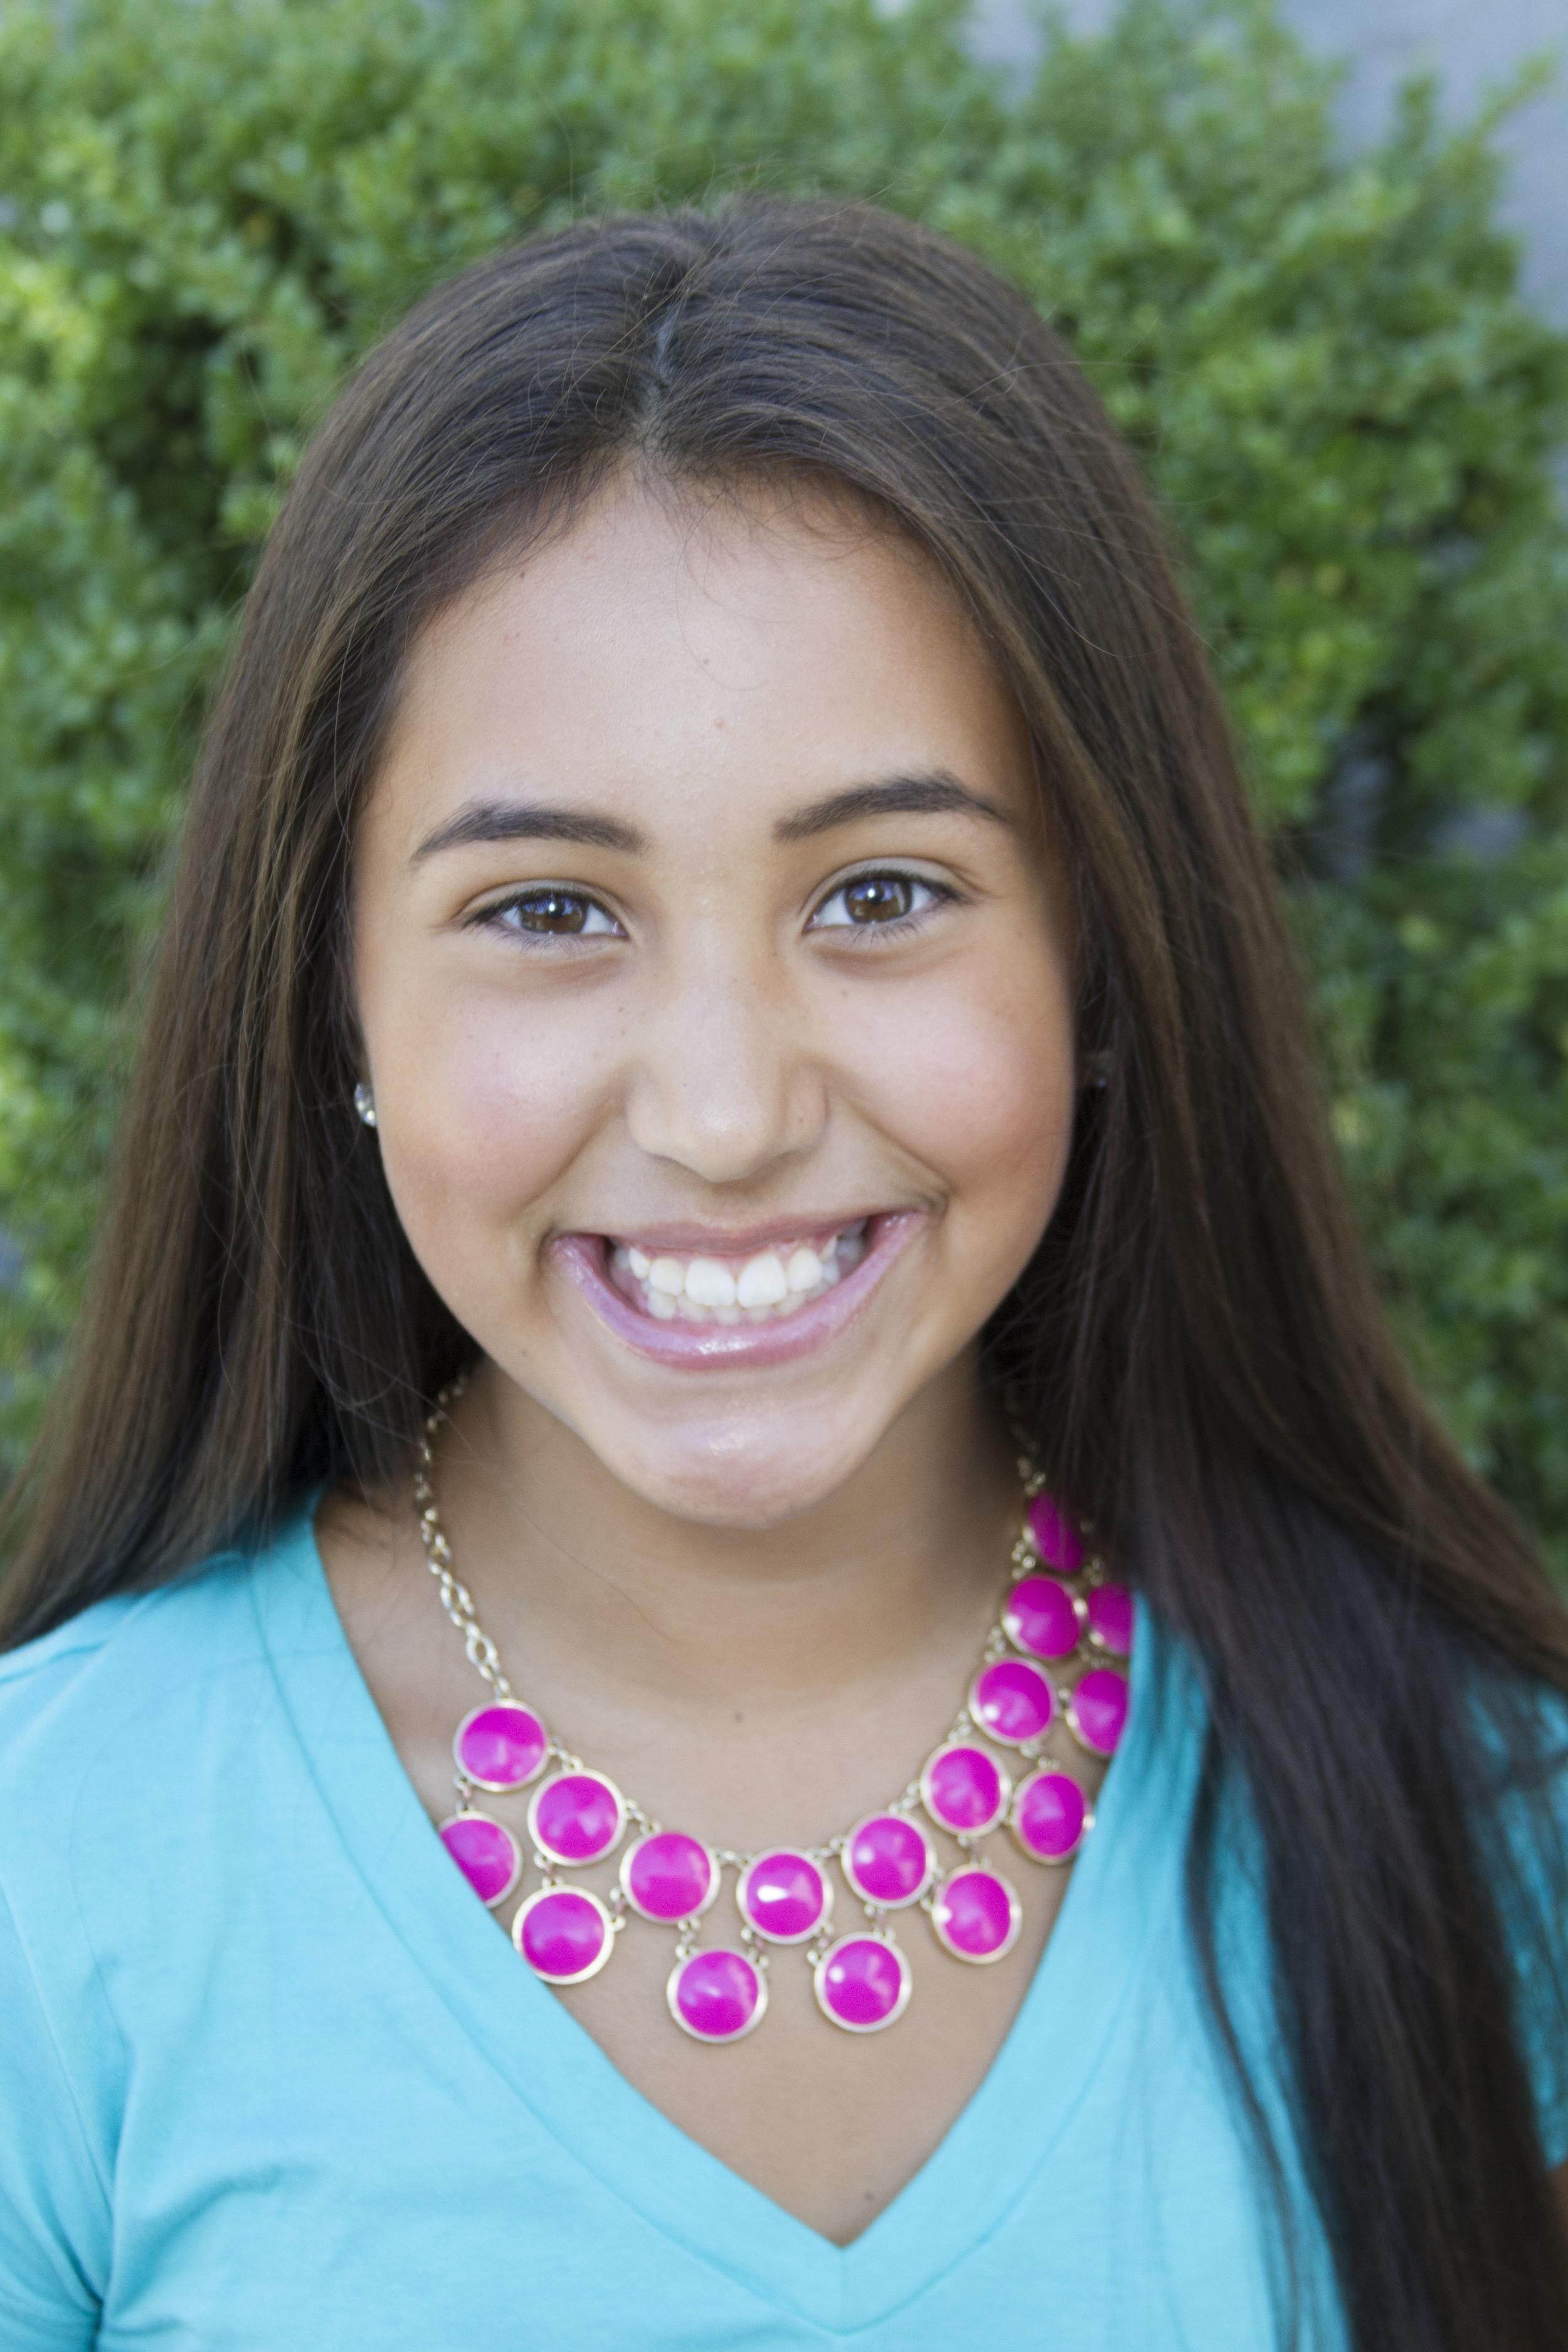 Novalee Lewis, Junior/Teen Dancer